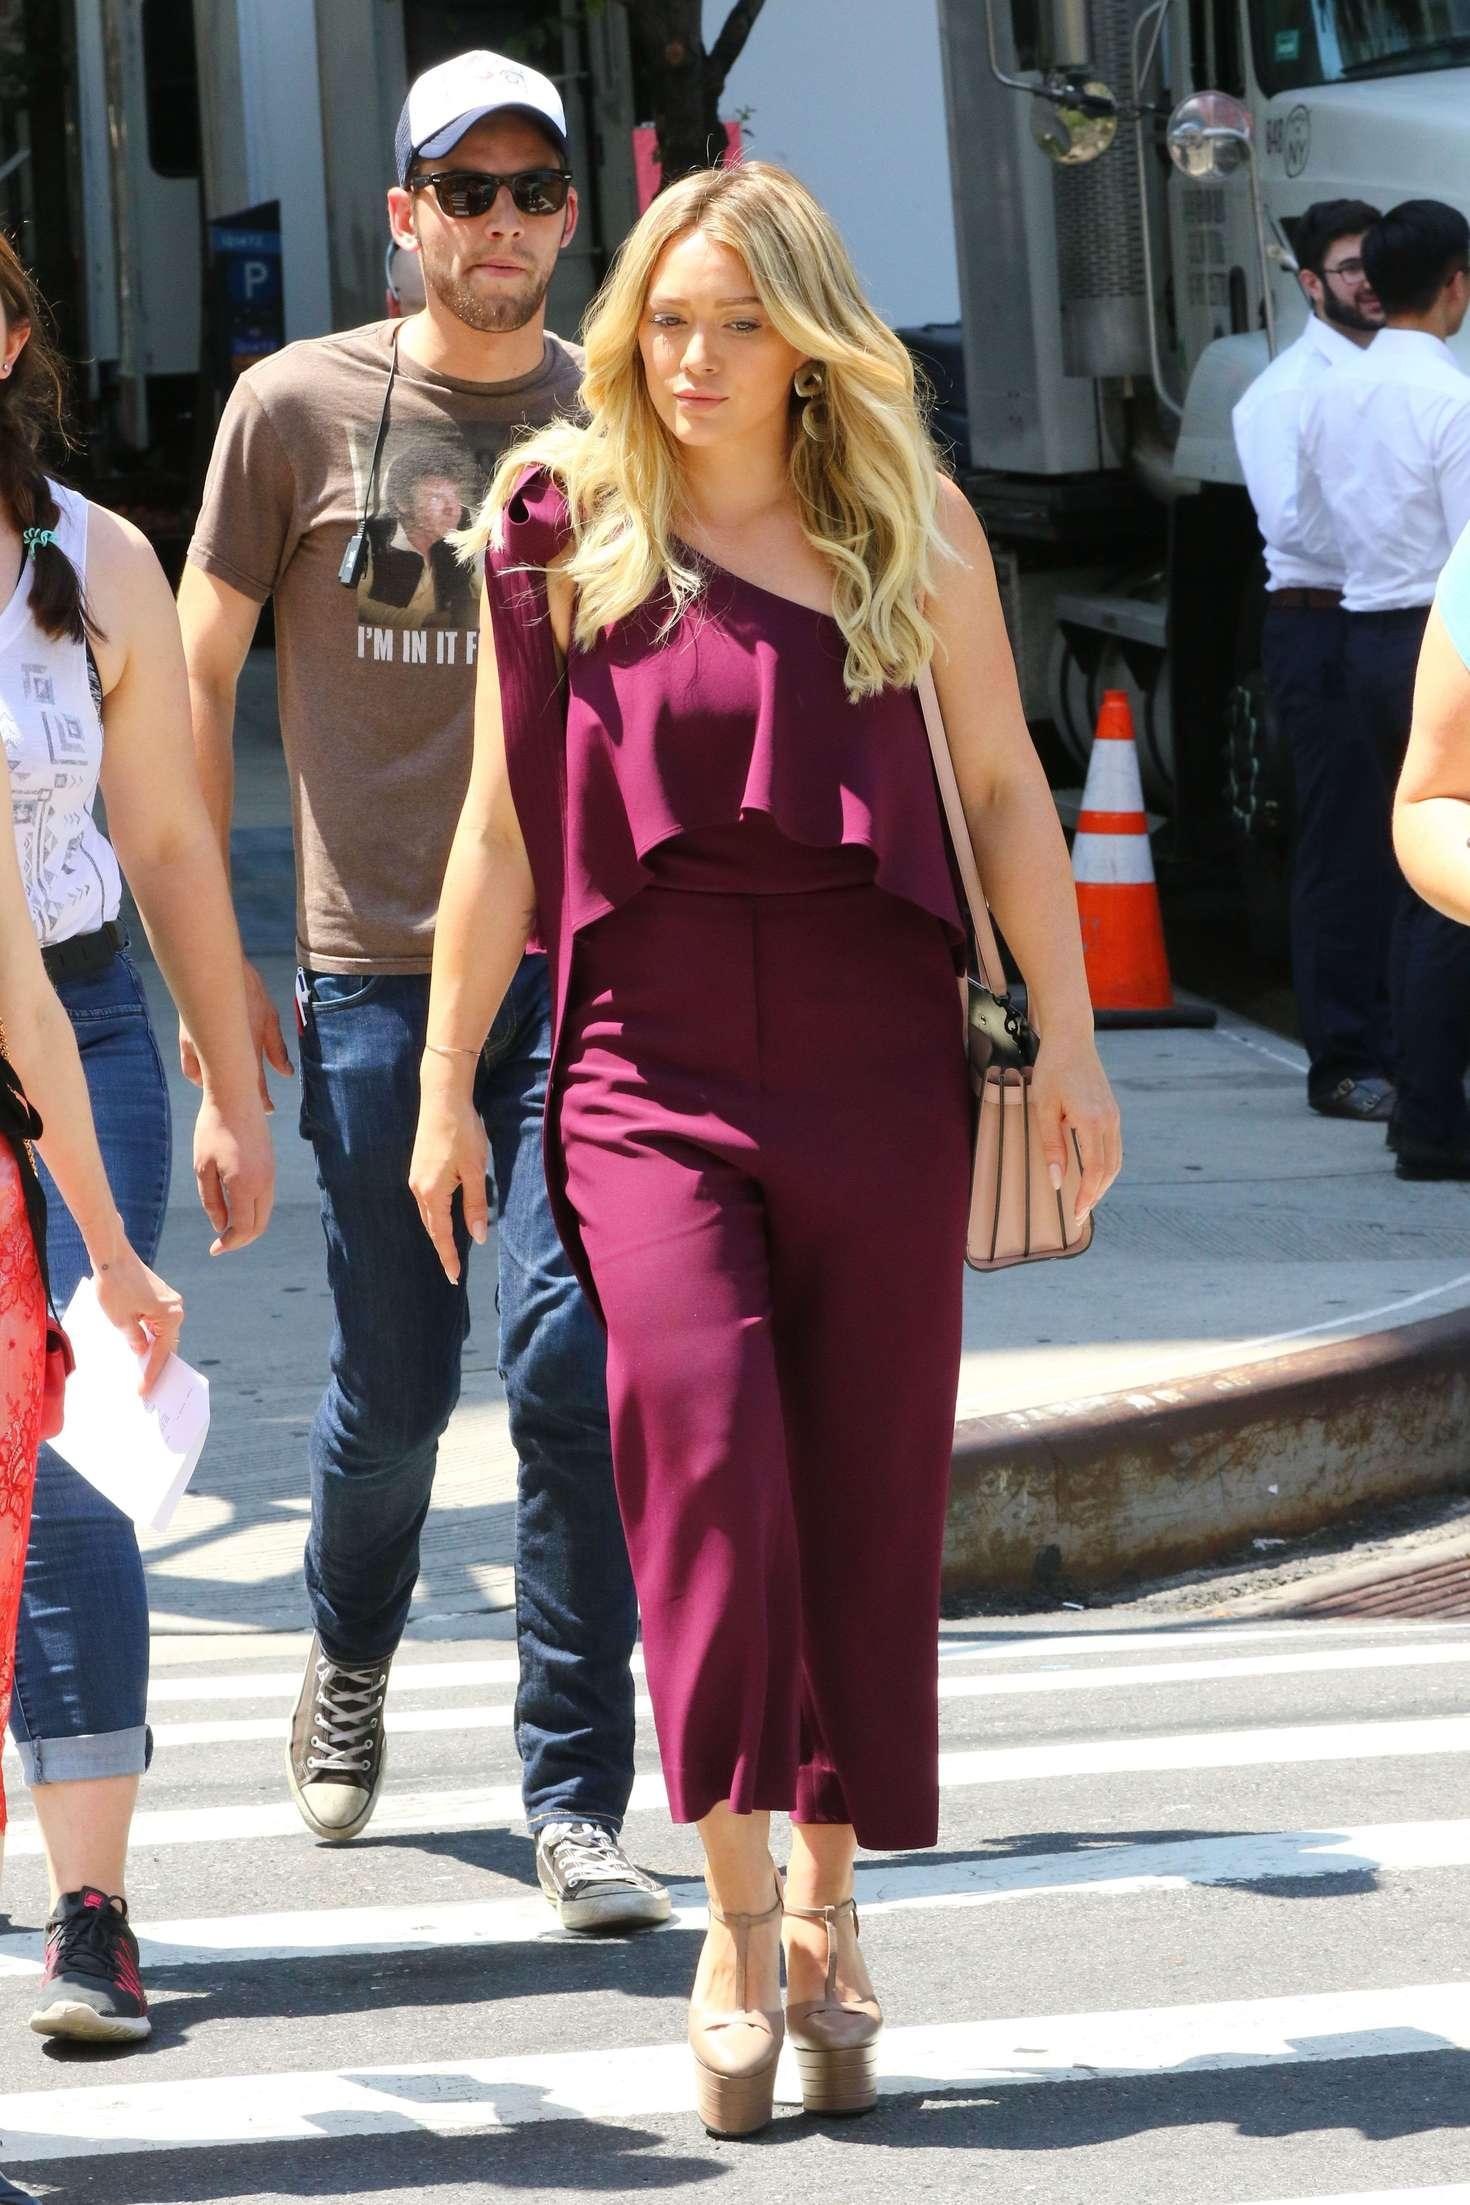 Hilary Duff 2017 : Hilary Duff on Younger Set -08